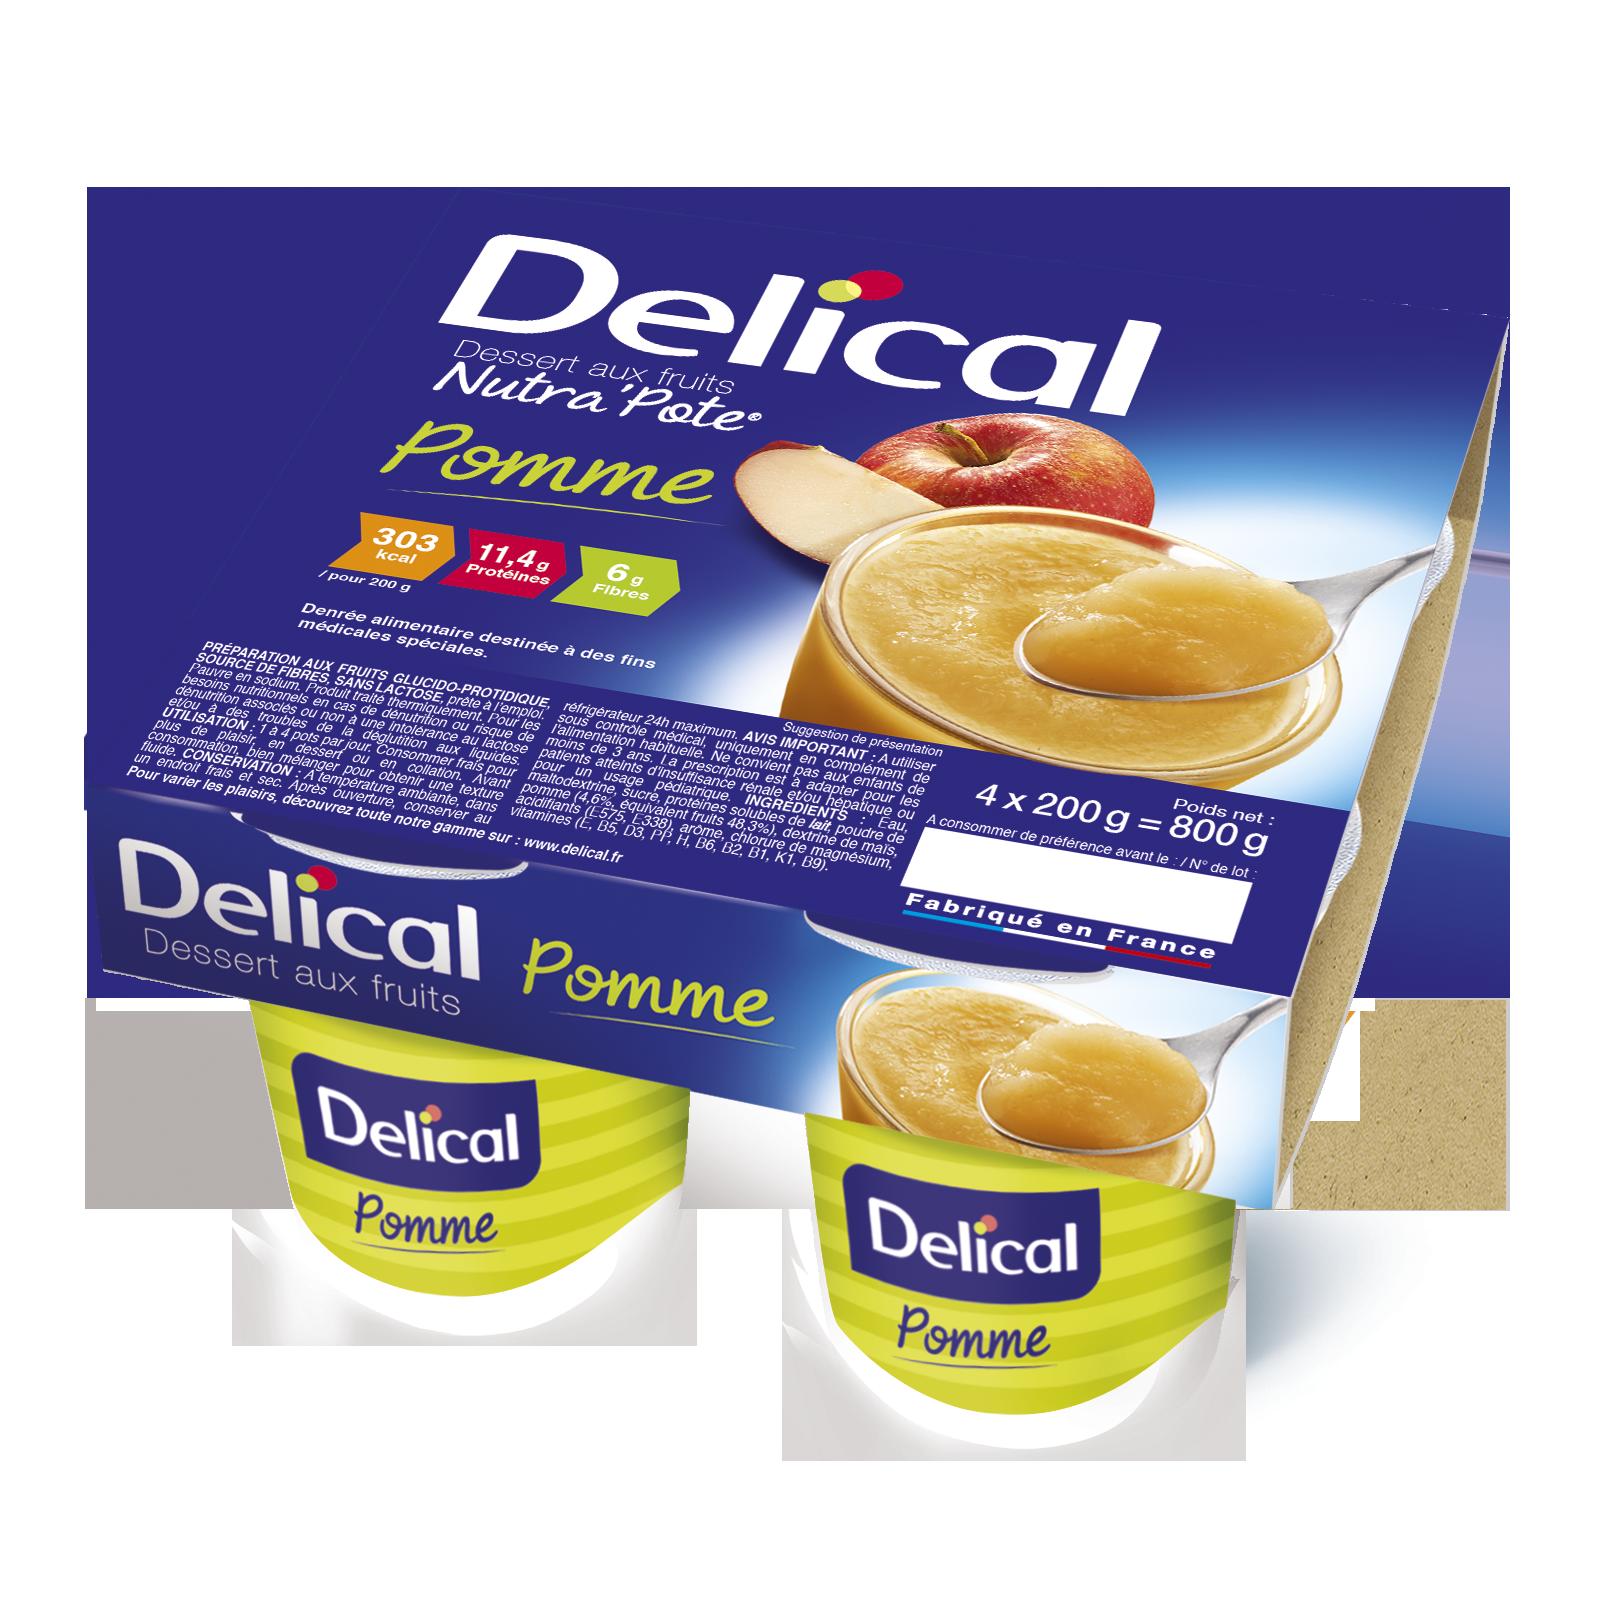 Delical Dessert Aux Fruits Nutra Pote Pomme